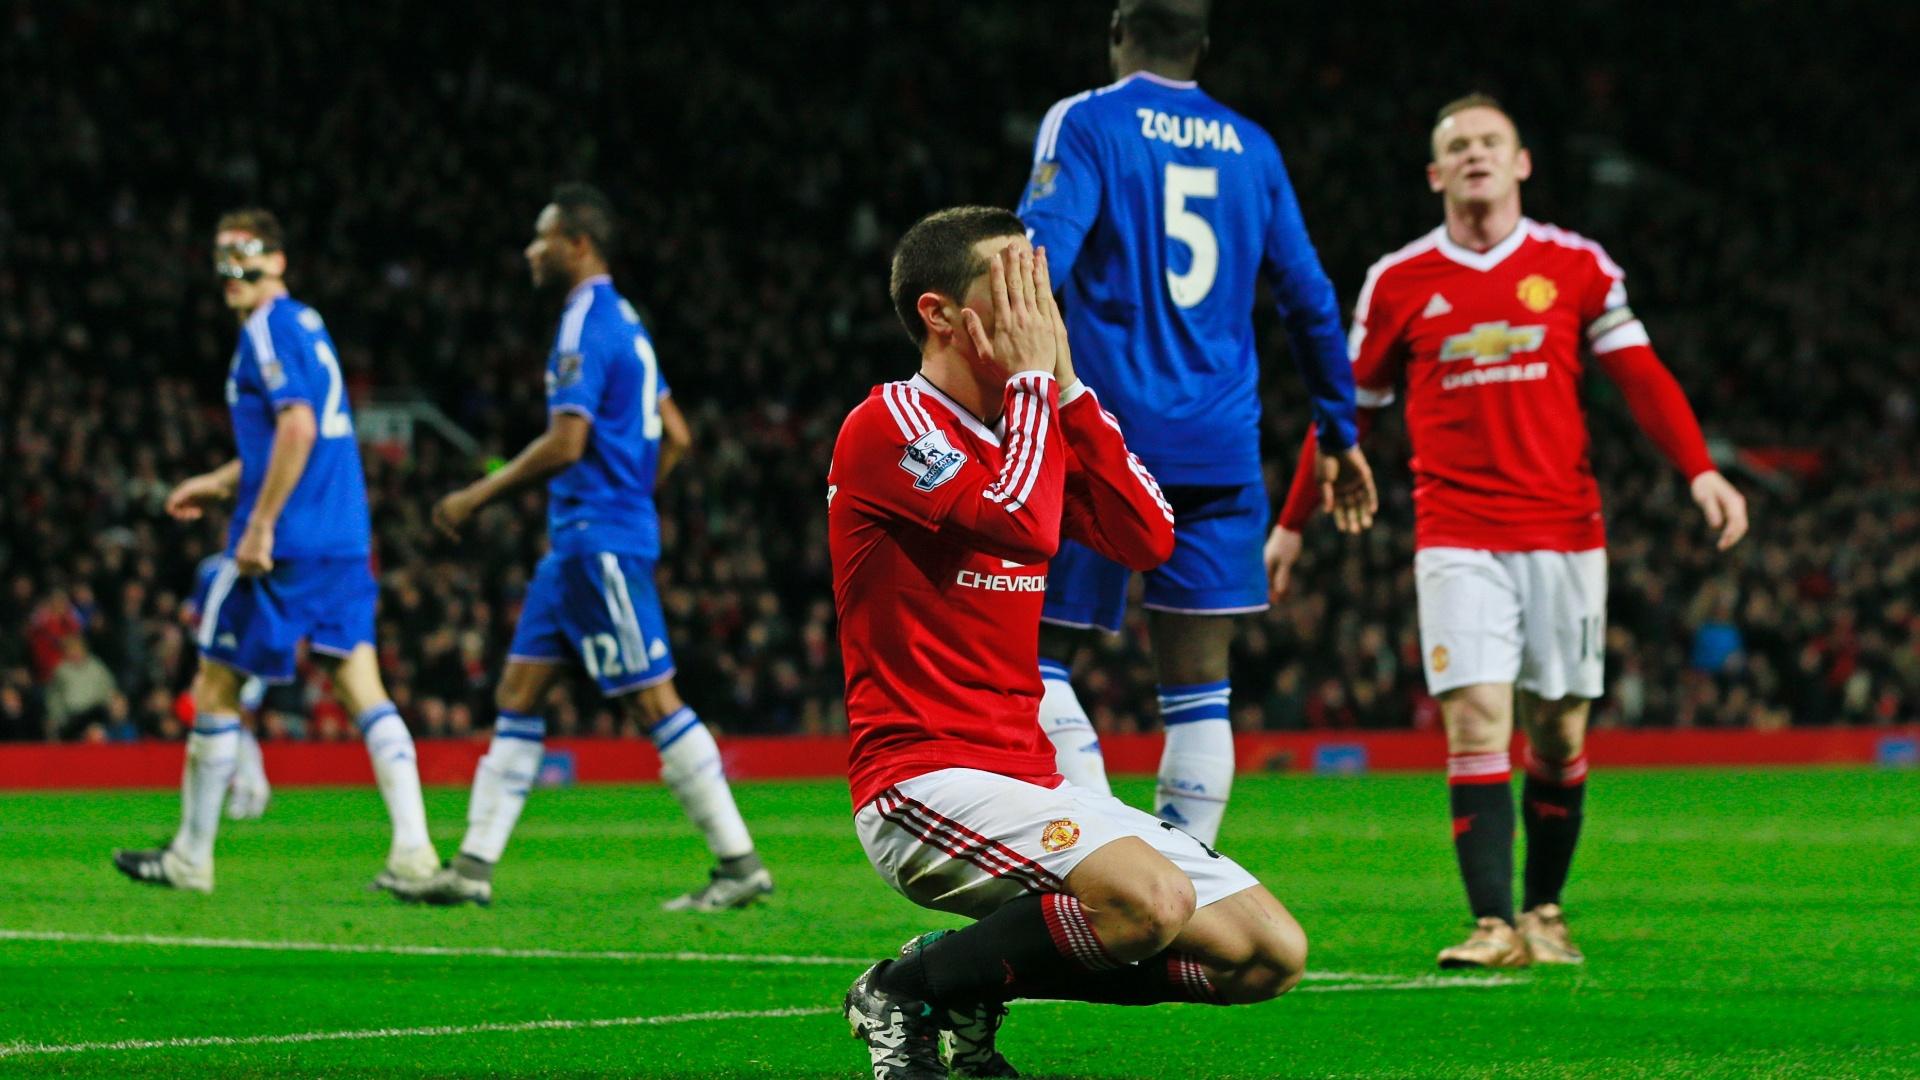 Ander Herrera lamenta gol perdido no jogo entre Manchester United e Chelsea